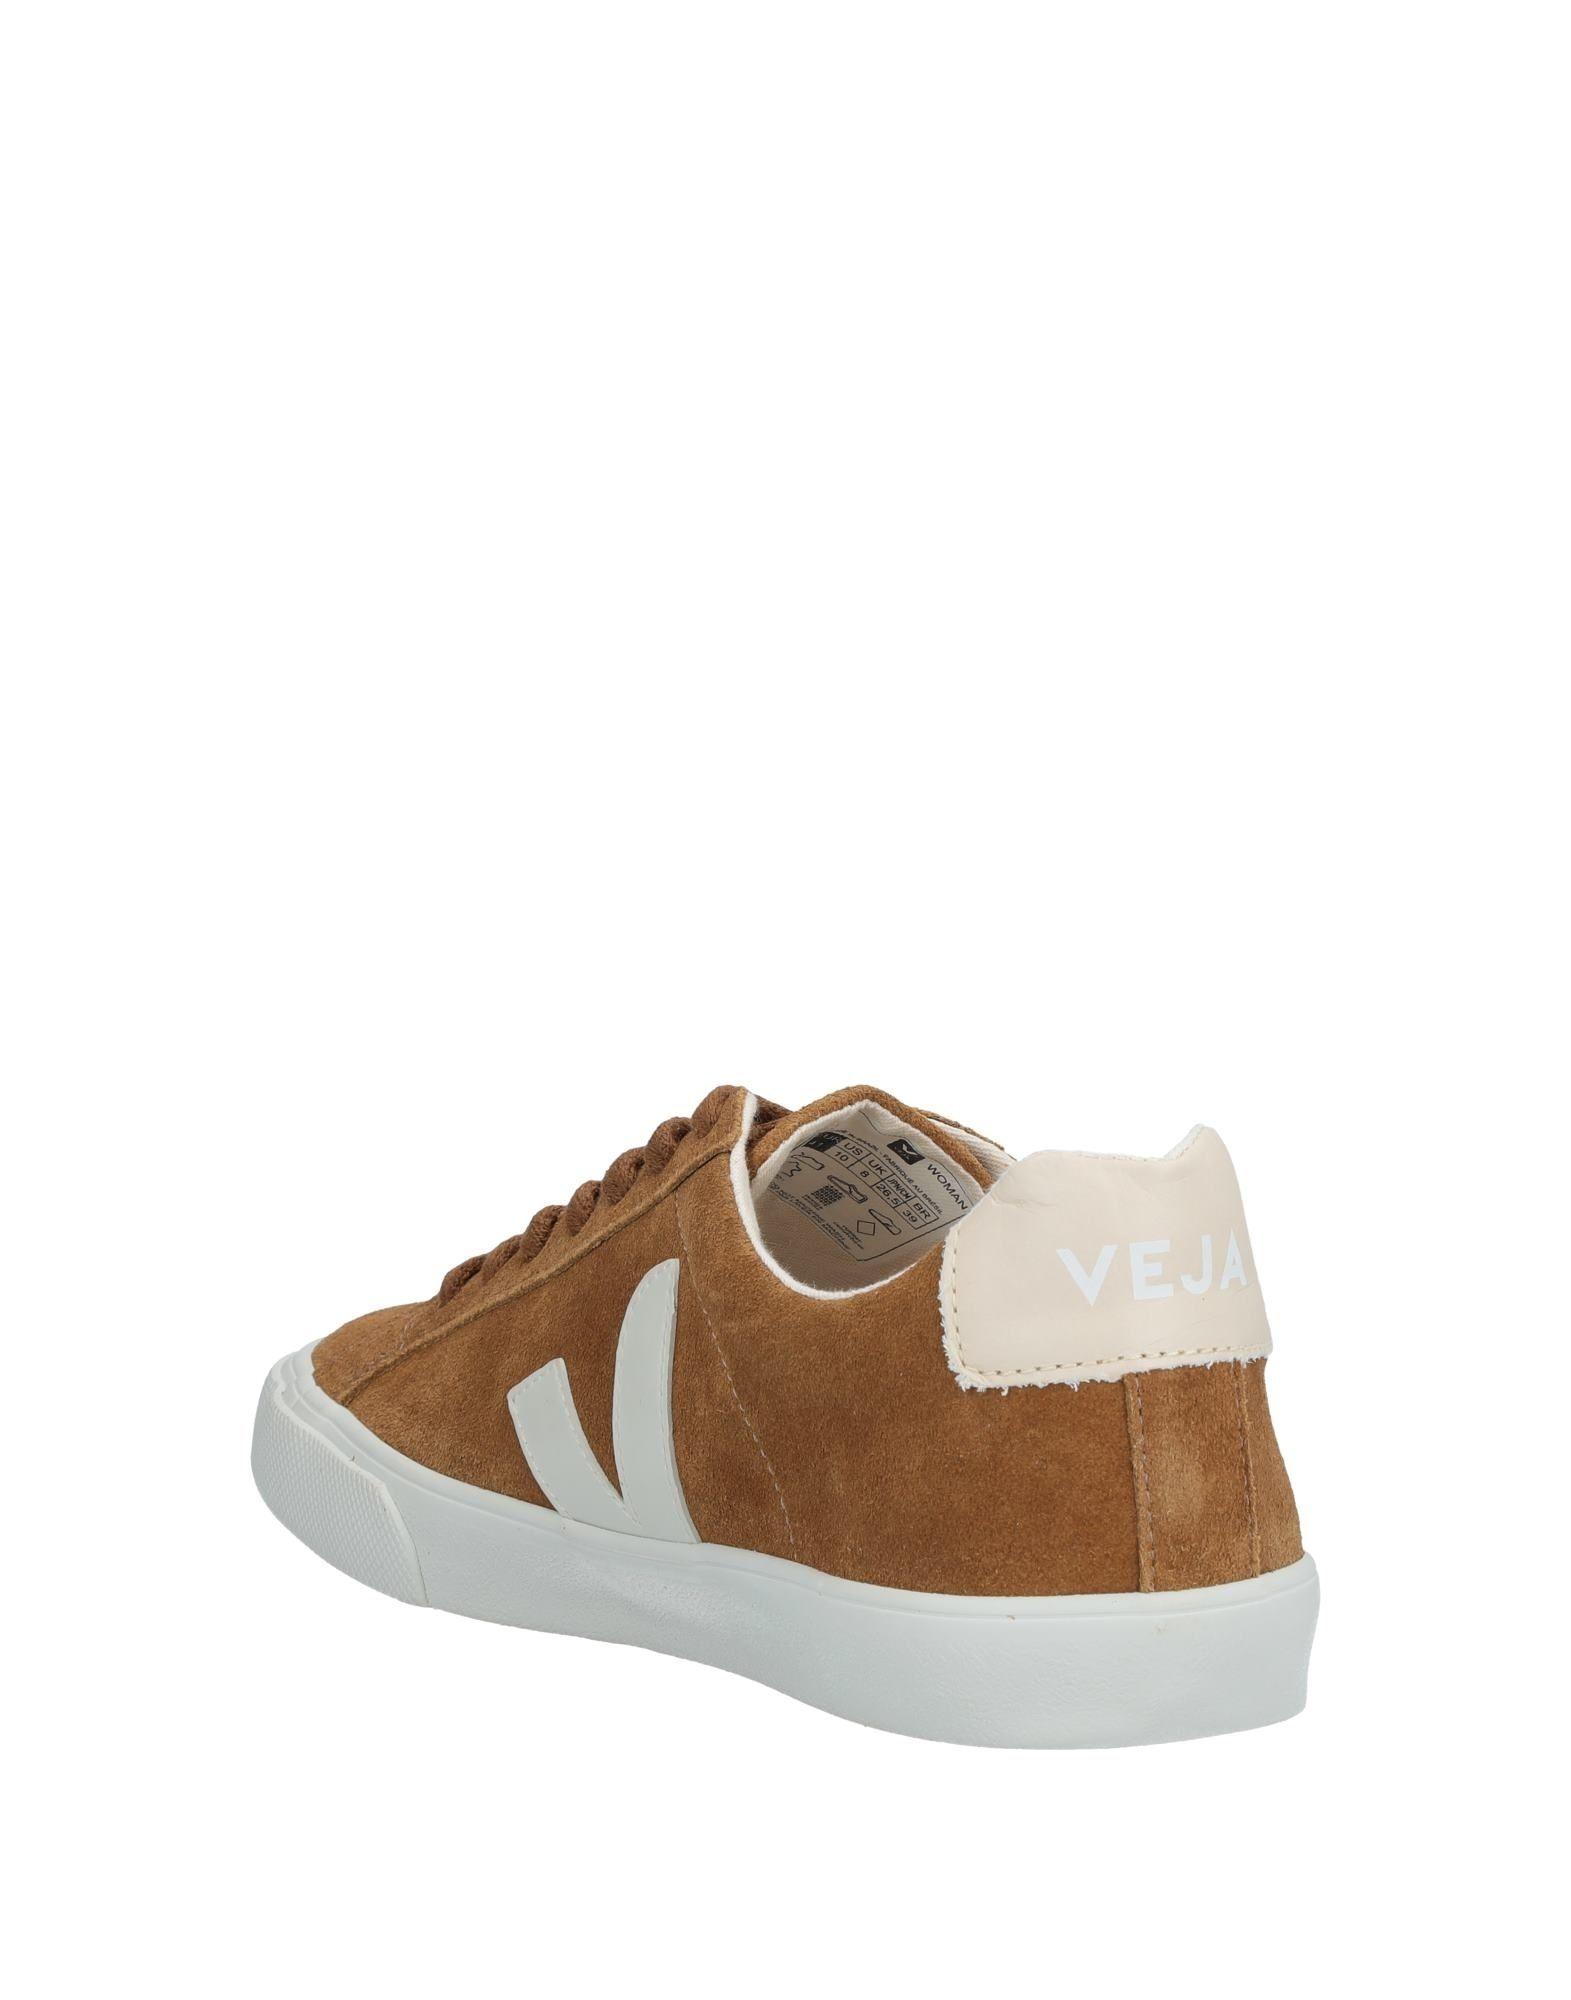 Veja Sneakers  Damen  Sneakers 11525686CU 6c5336